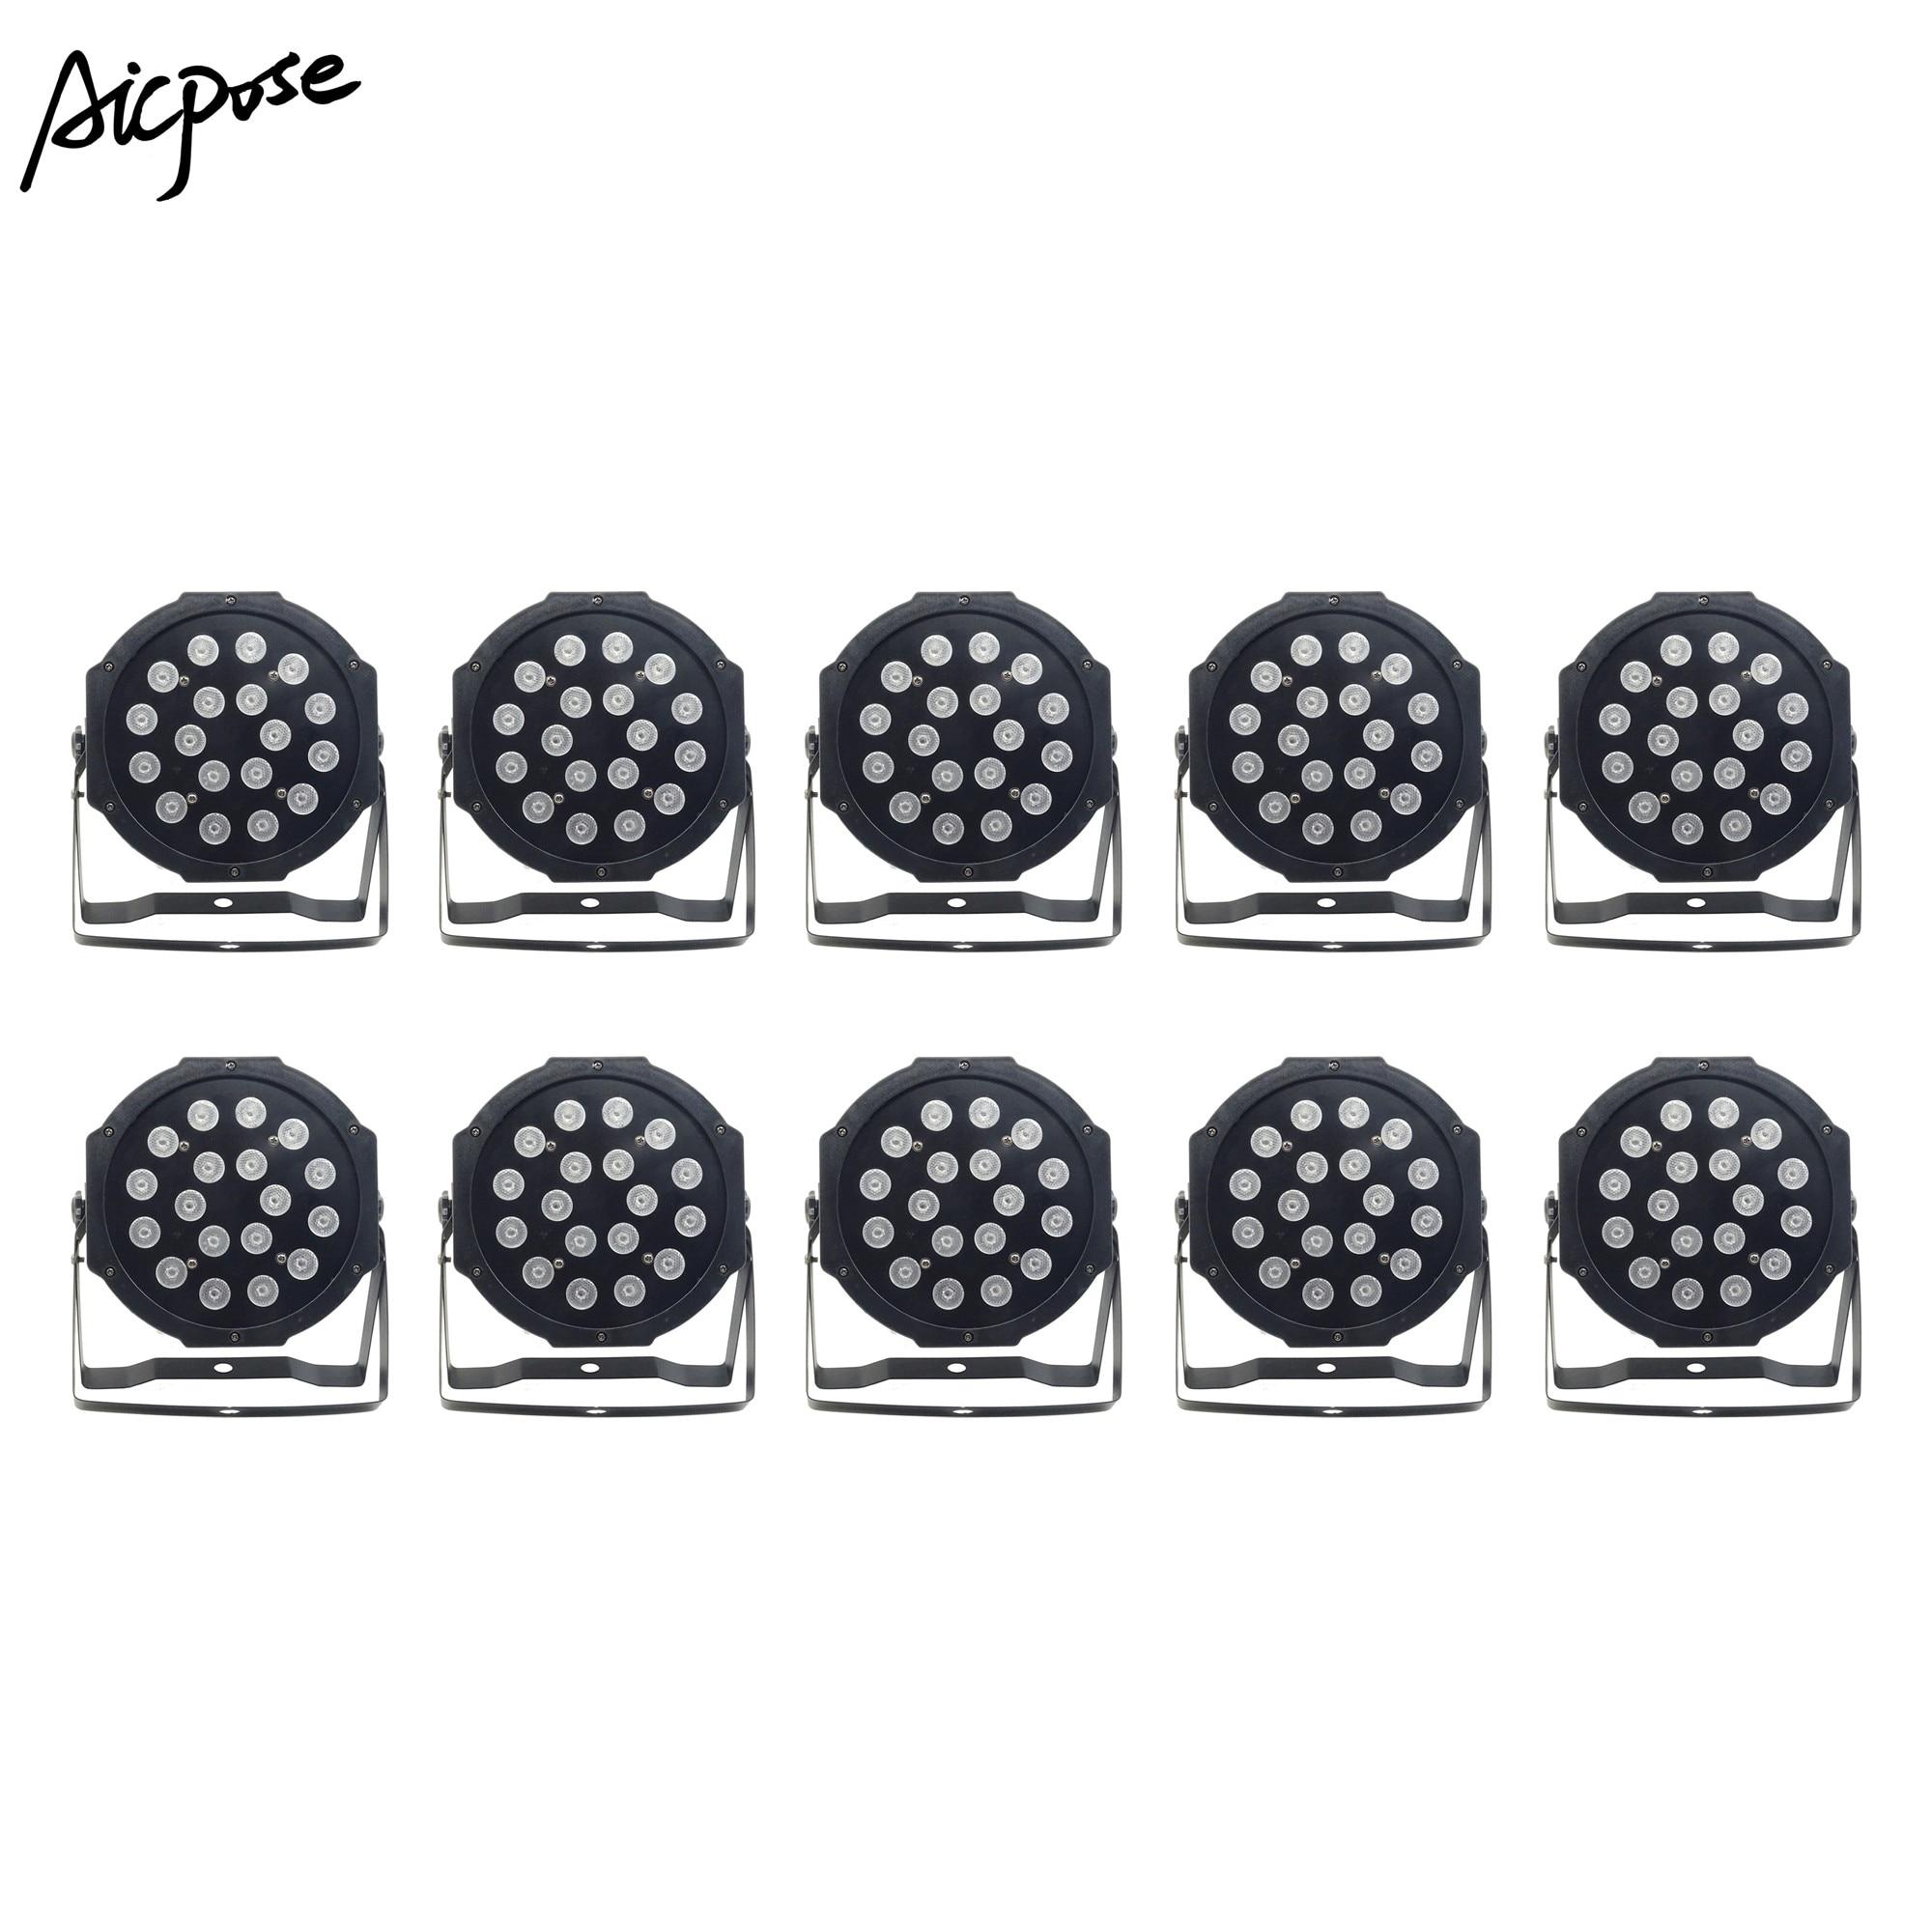 10pcs/lots 18pcs 3w Led Lamp Beads 18x3 Led Par Lights RGB 3in1 Flat Par Led Dmx512 Disco Lights Professional Stage Dj Equipment